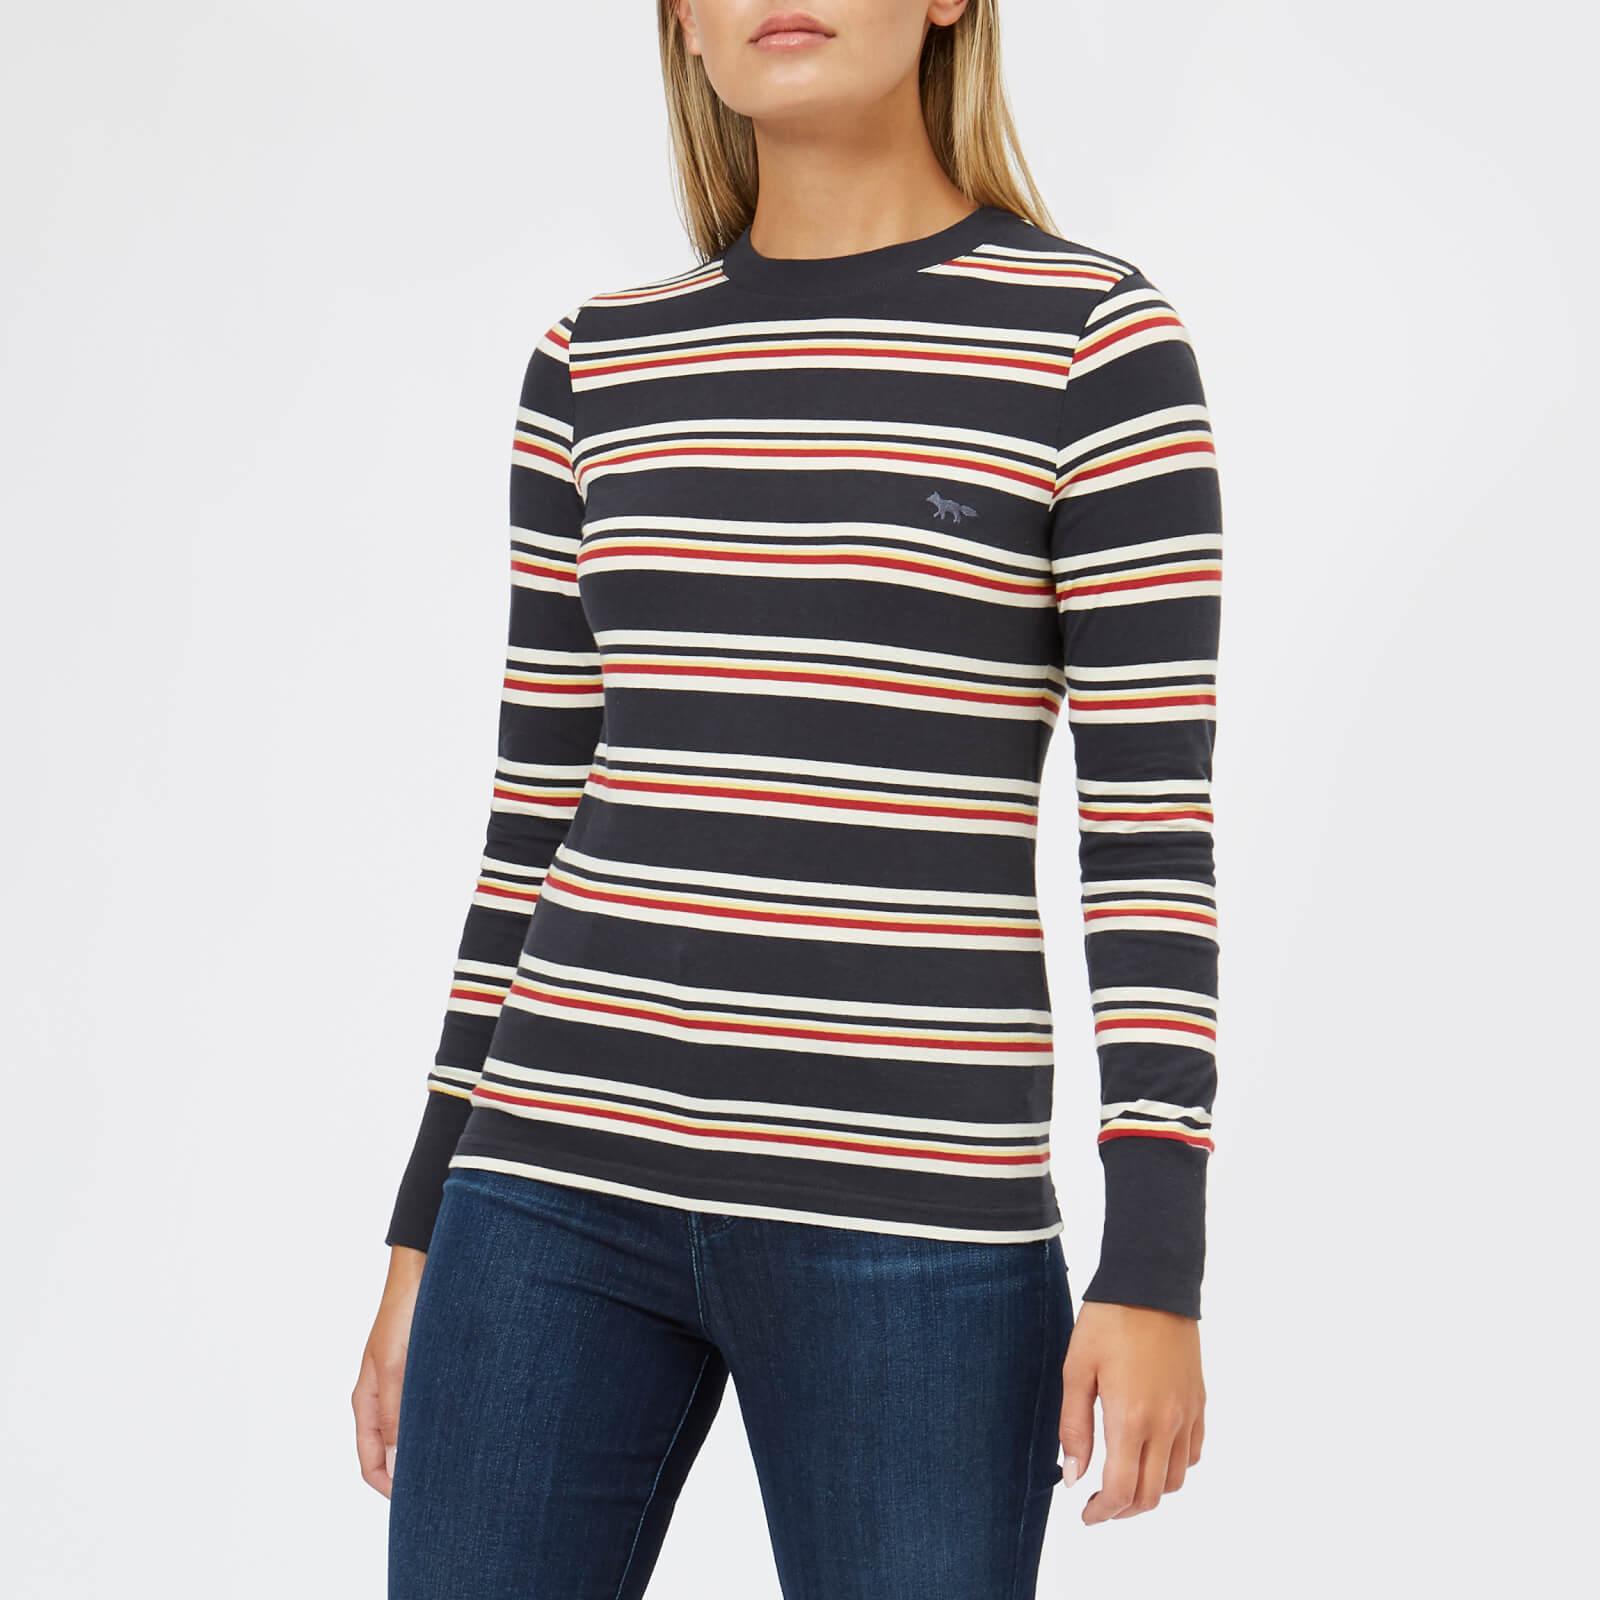 72b35731e2 Maison Kitsuné Women's Long Sleeve Stripes T-Shirt - Multicolor Stripes - Free  UK Delivery over £50